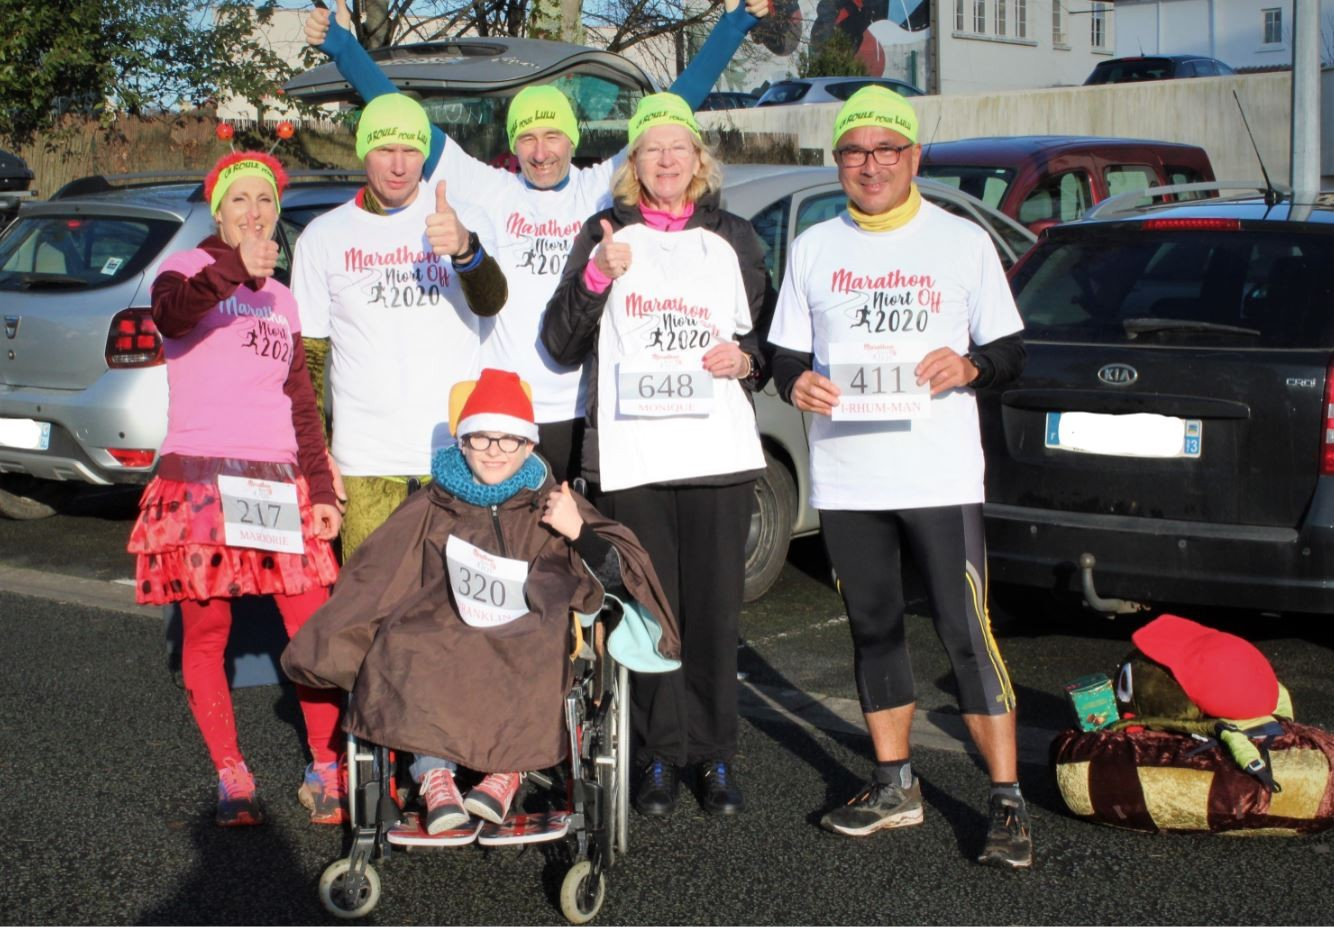 Marathon de la Saint-Sylvestre